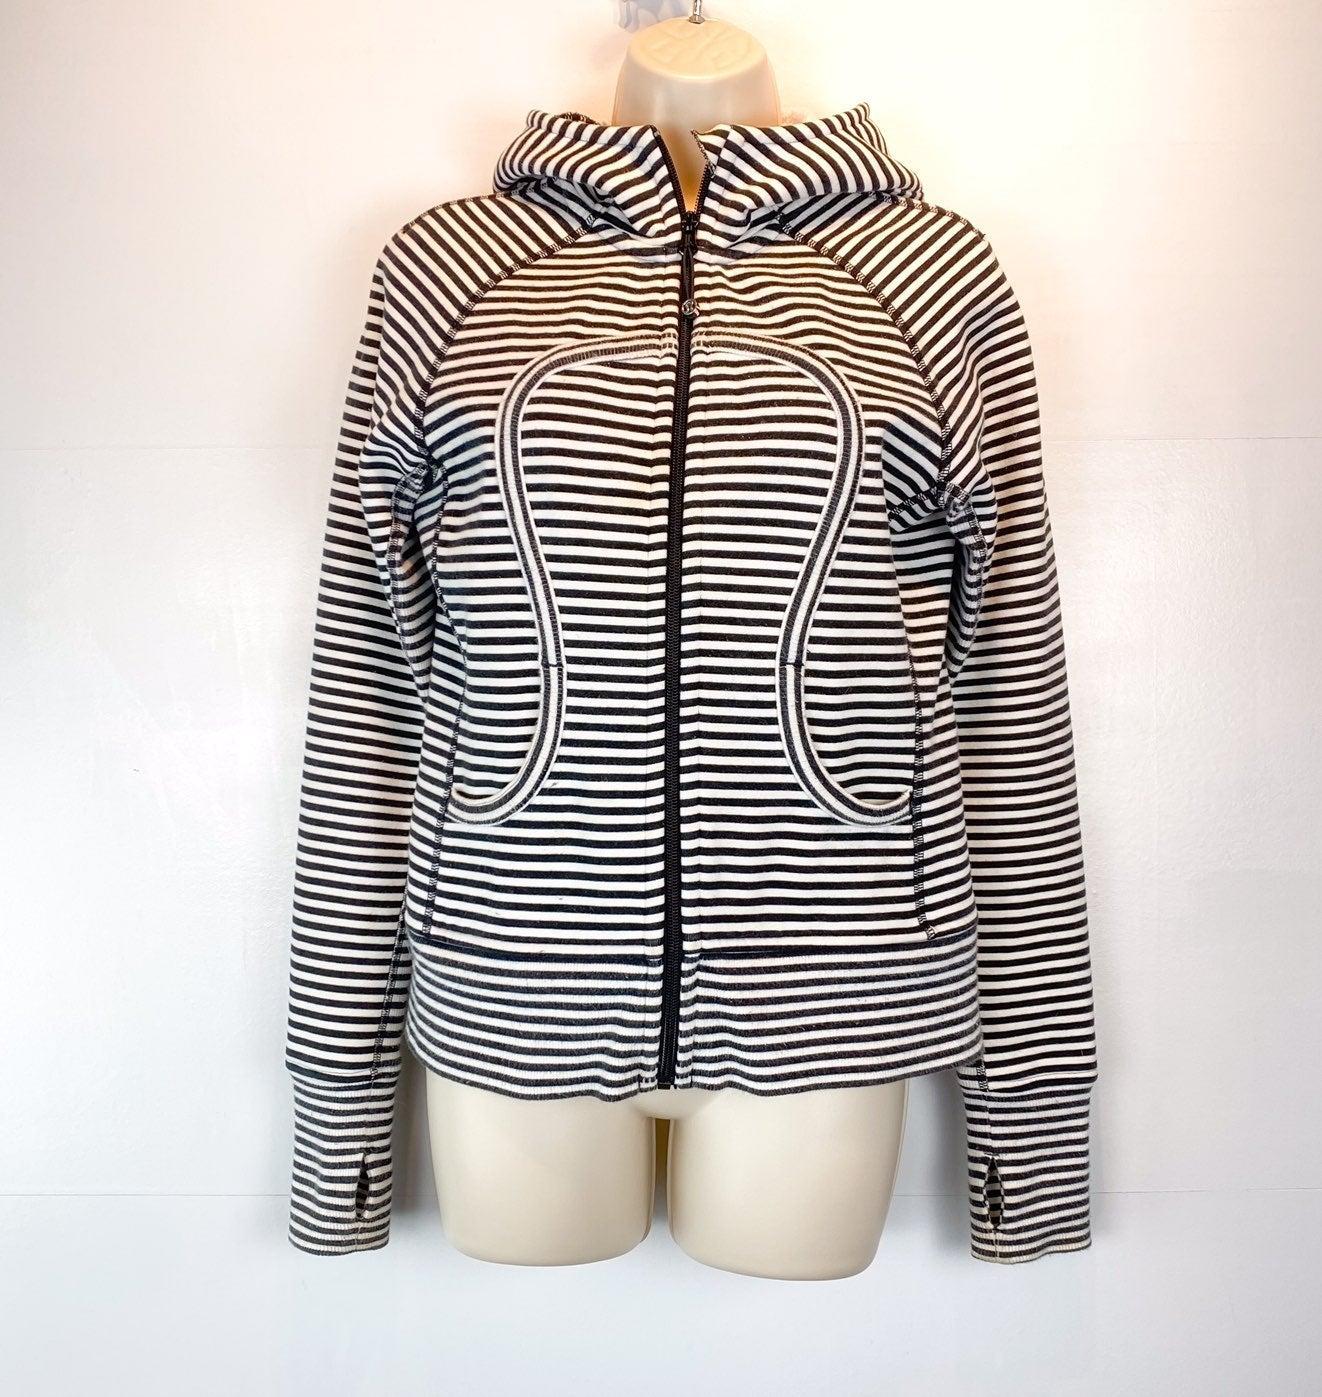 Lululemon movement jacket sz 4